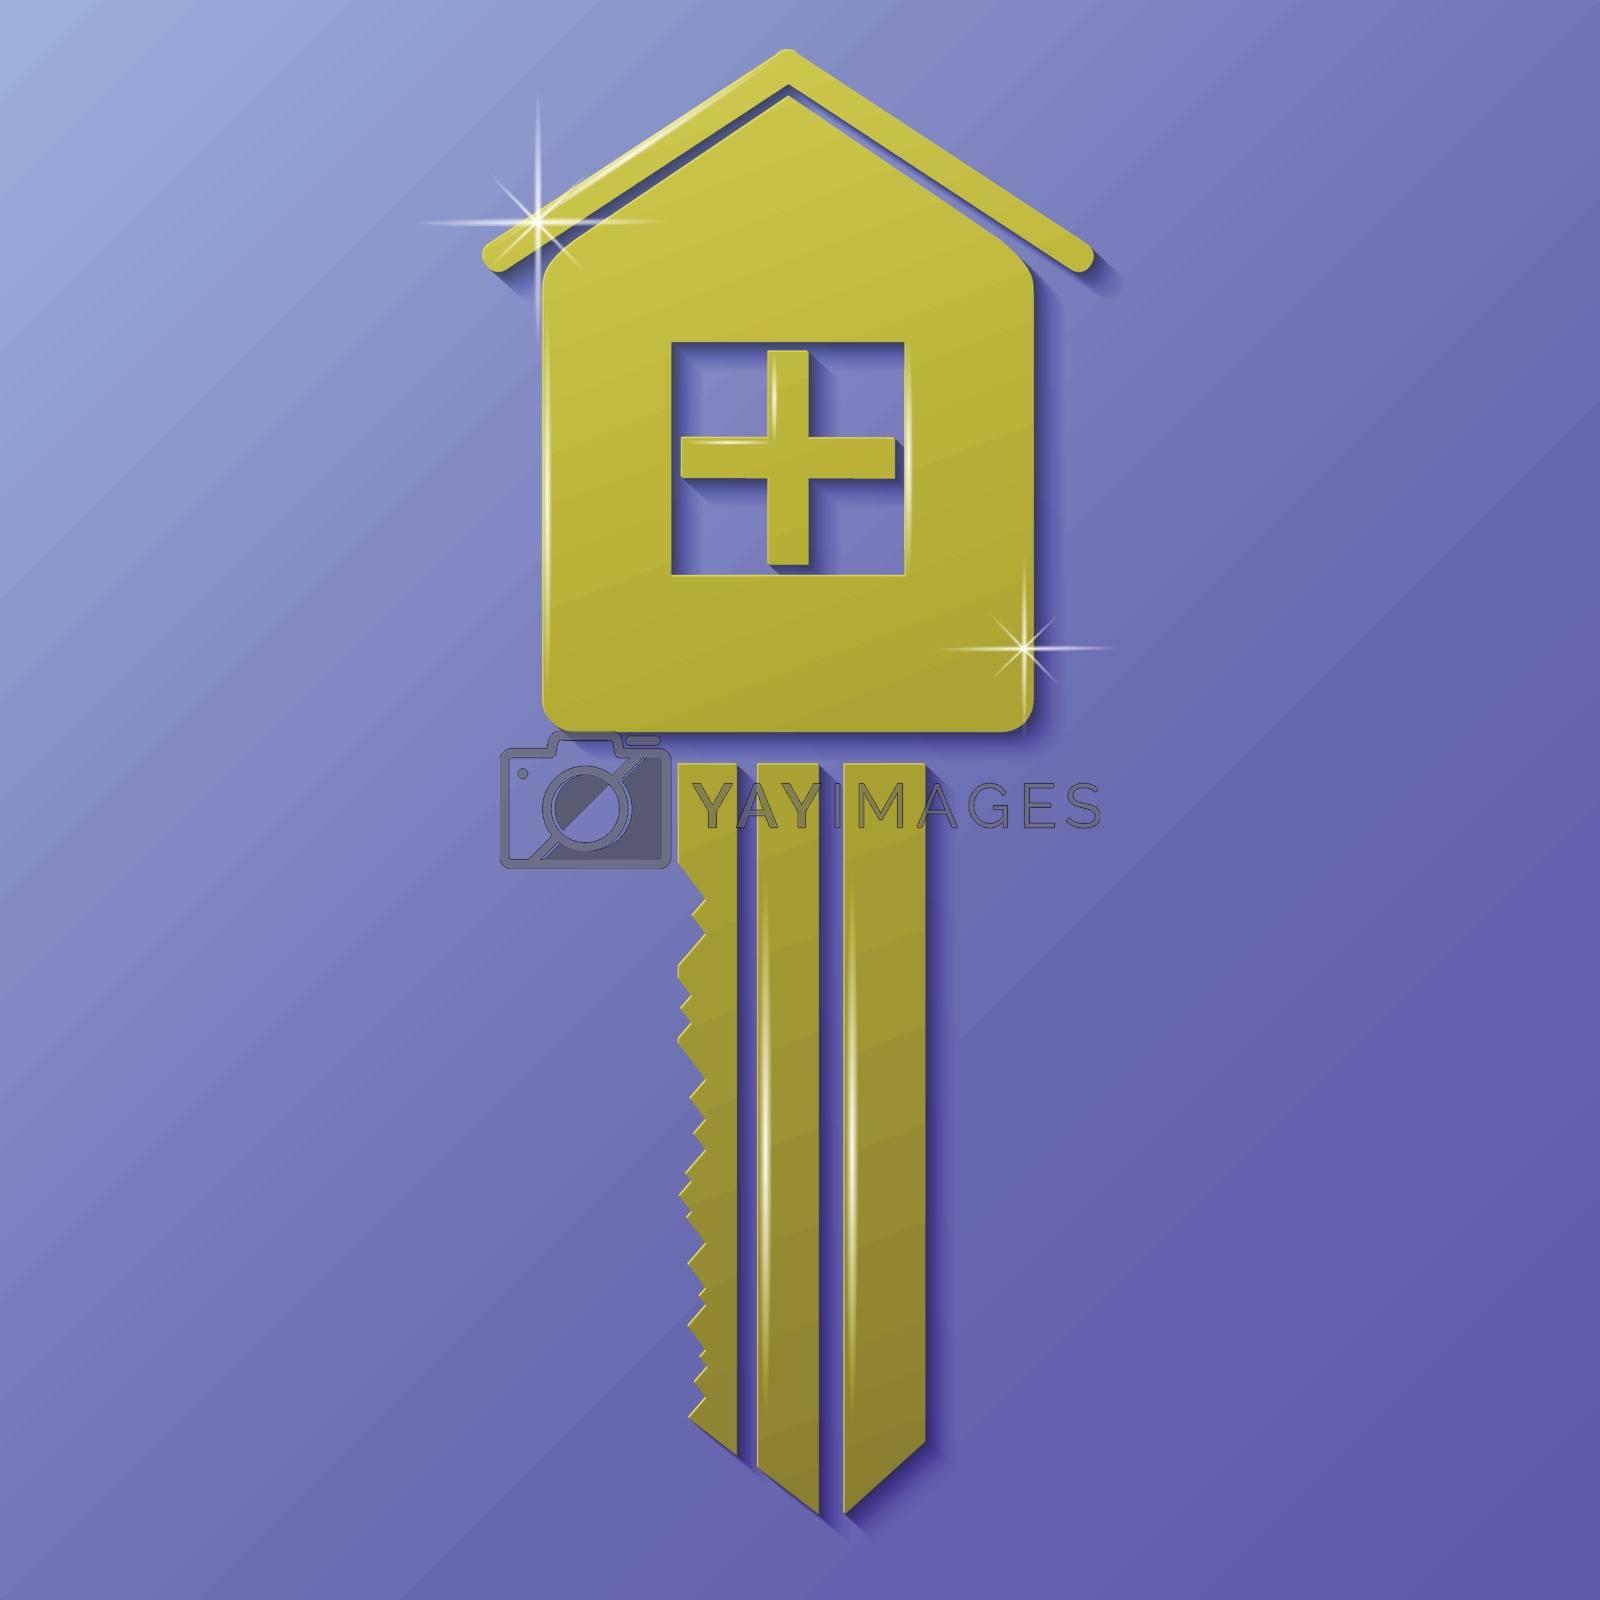 Royalty free image of house key by valeo5